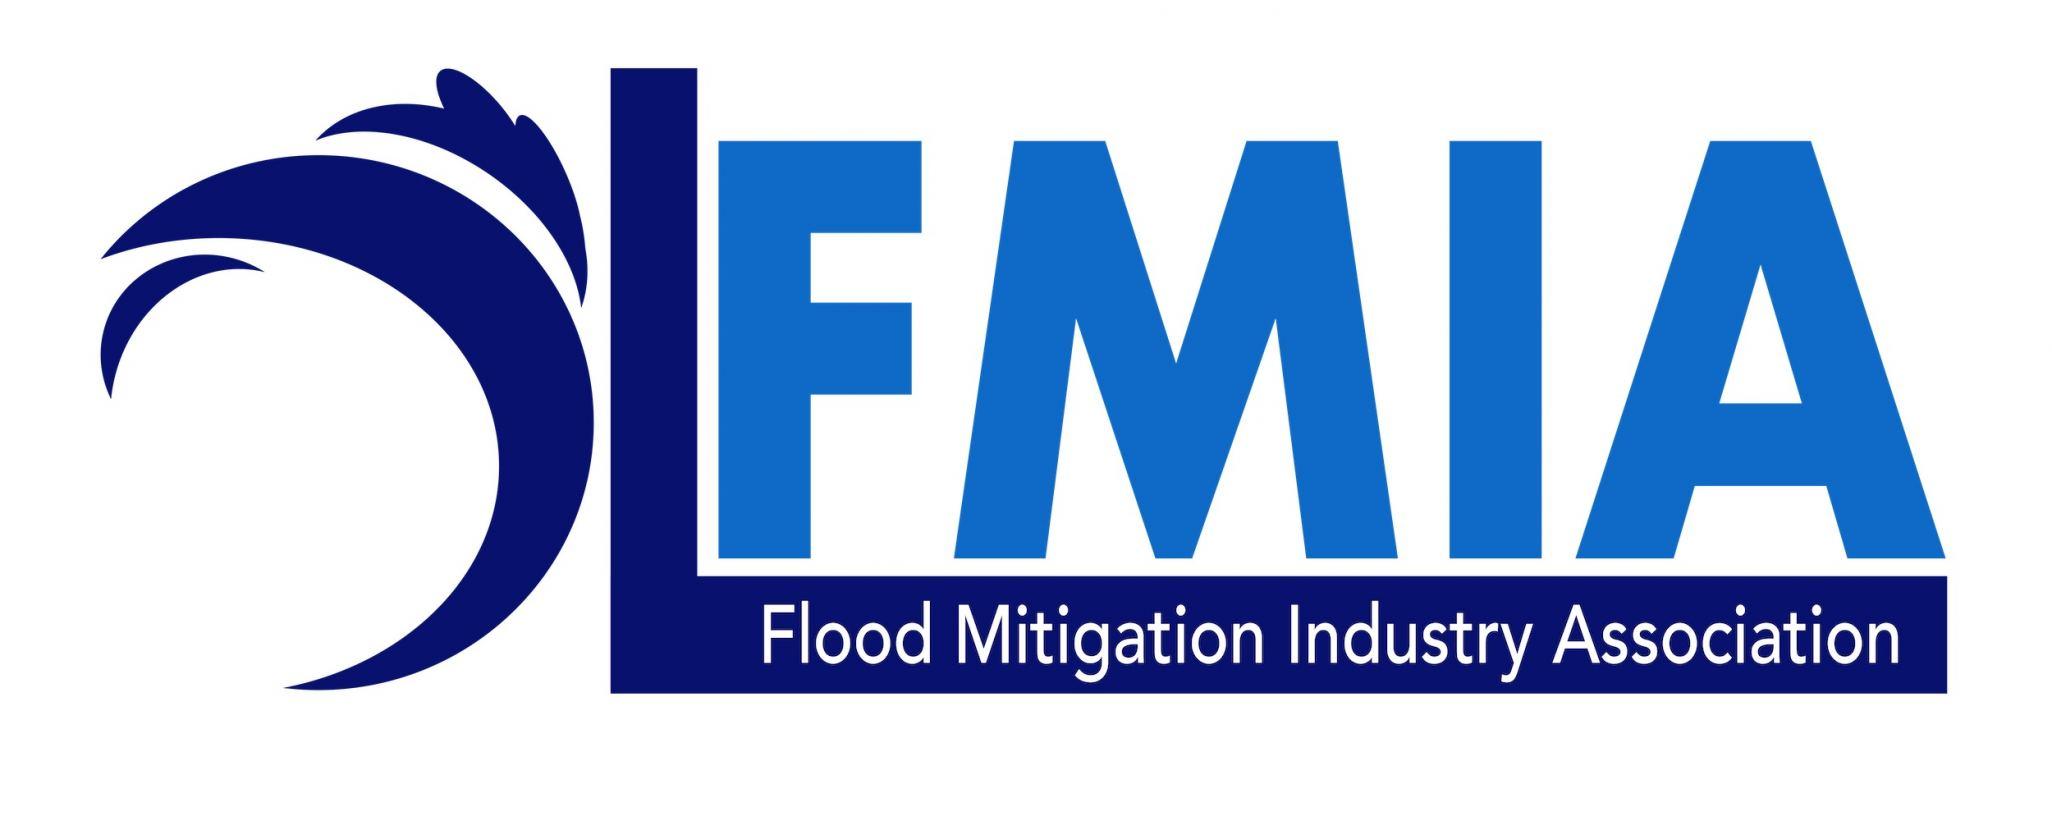 Flood Mitigation Industry Association Logo